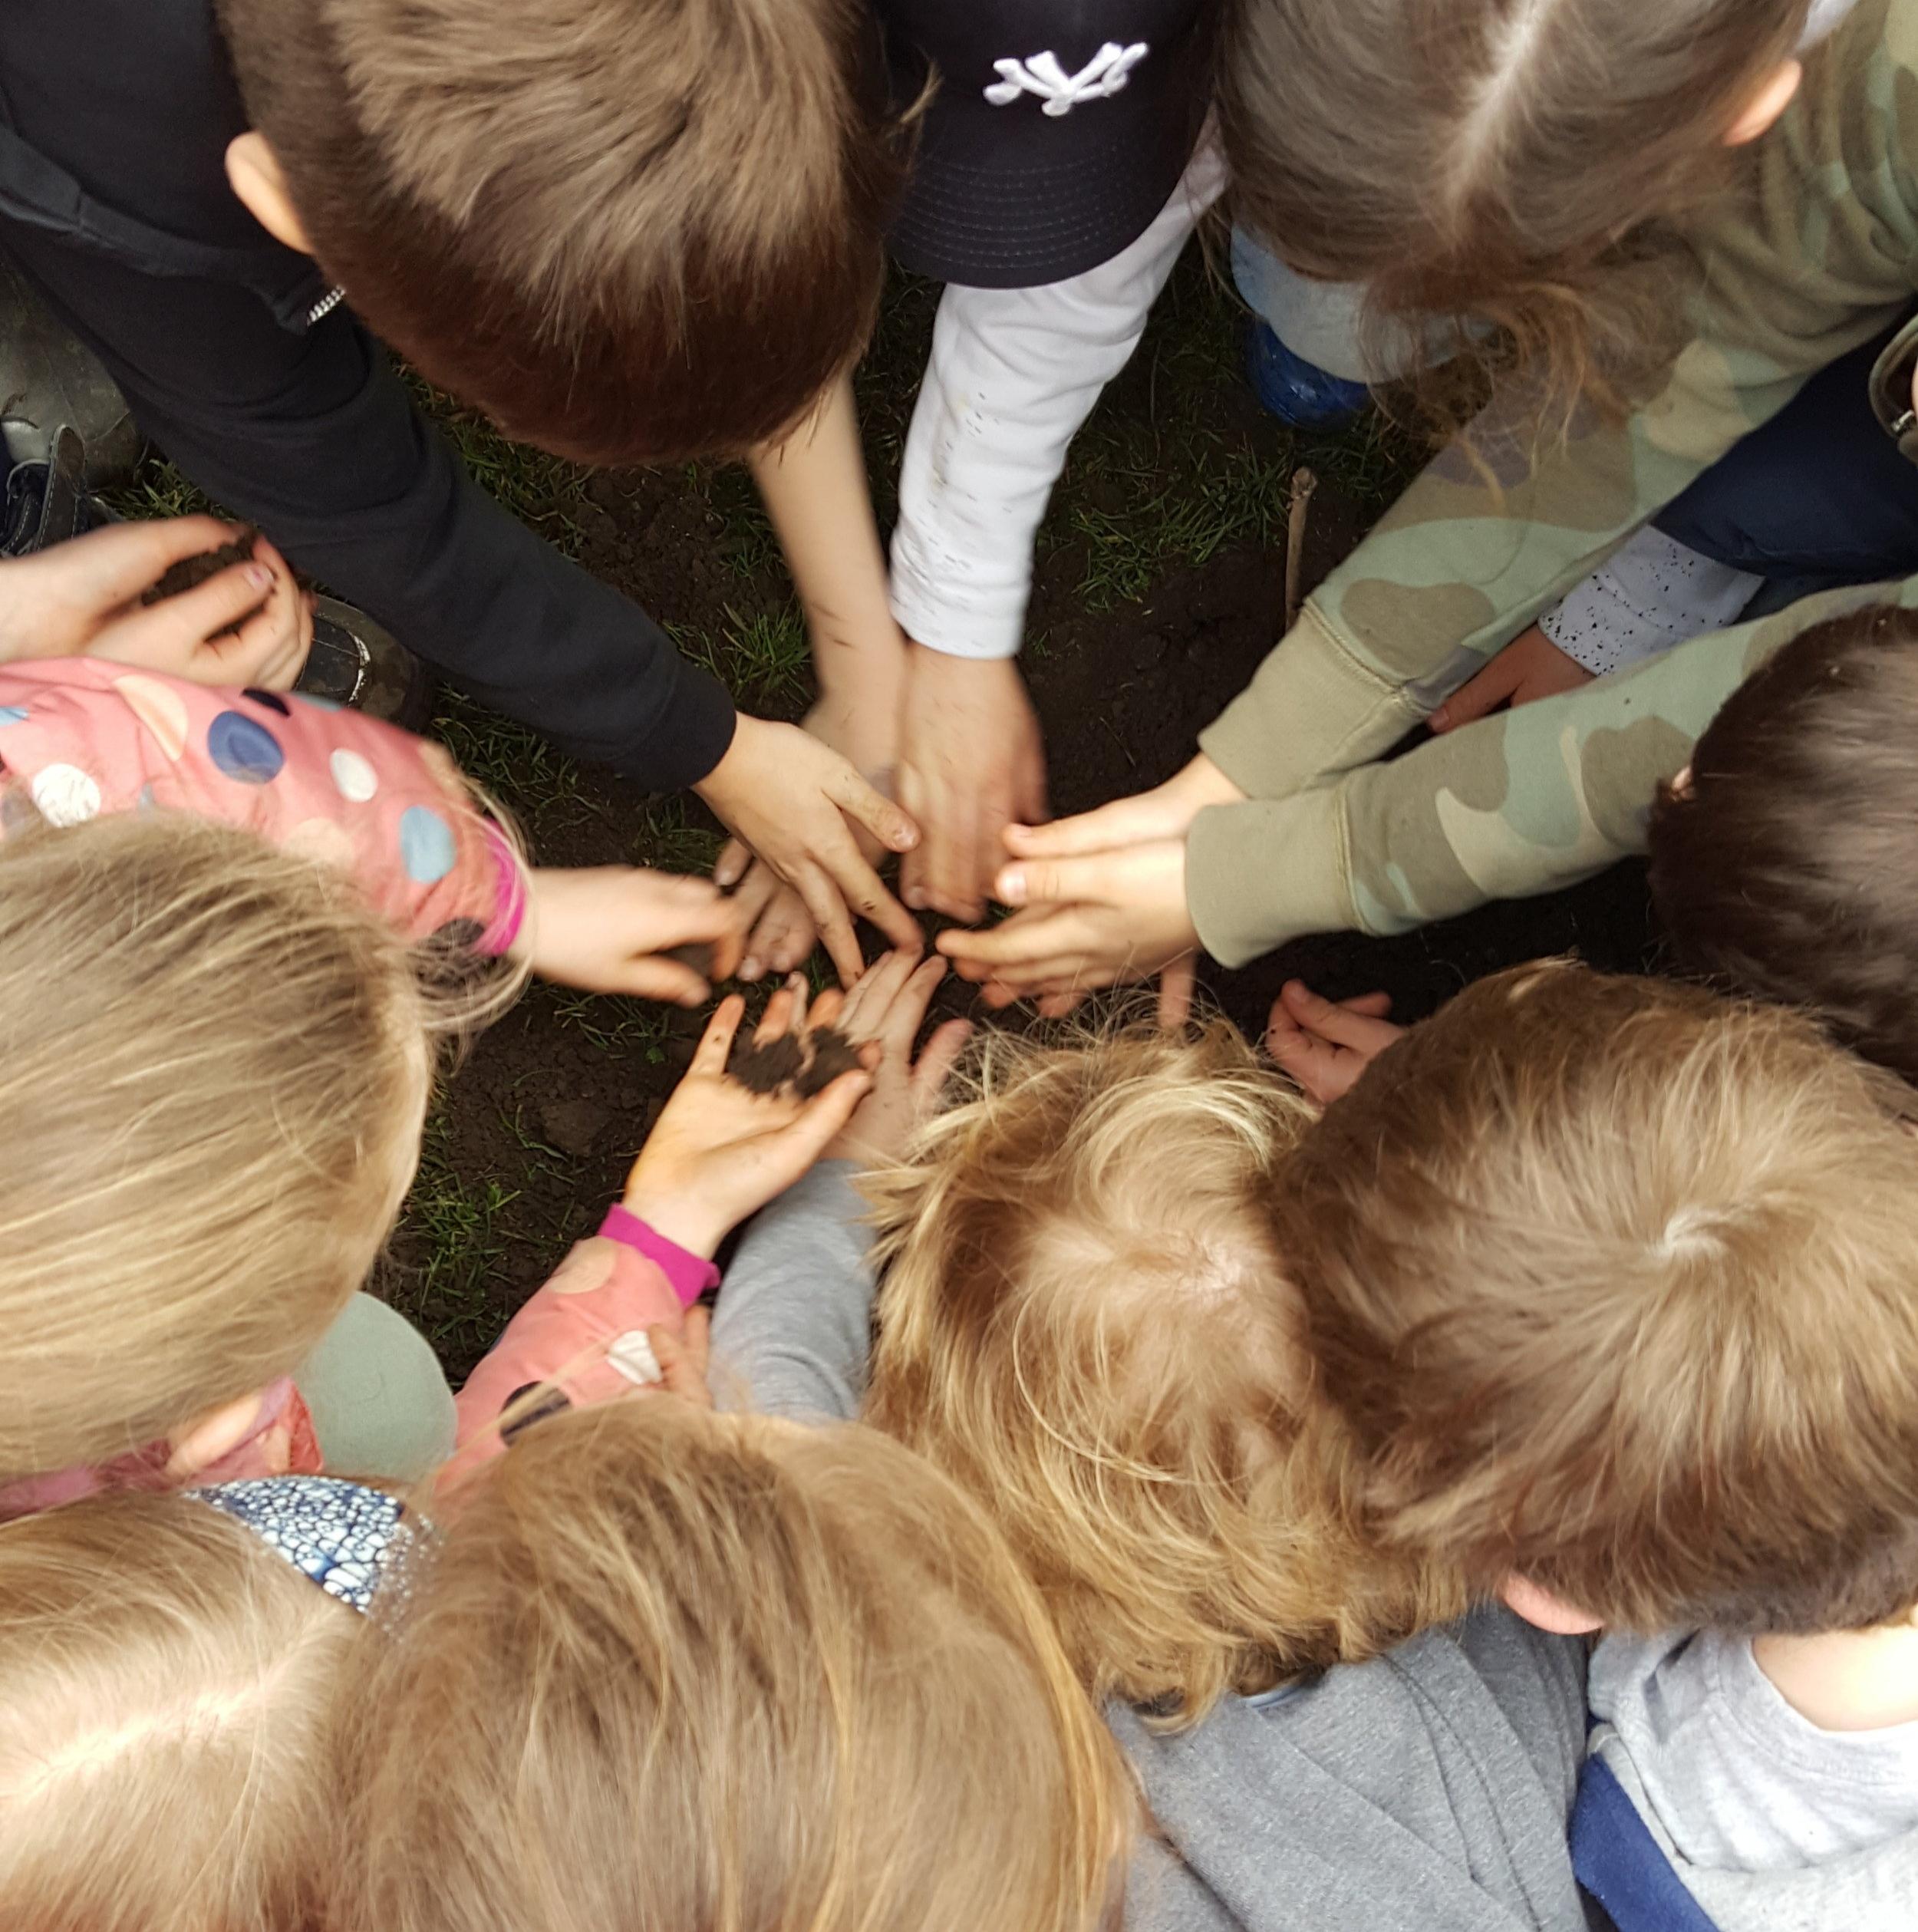 School children getting their hands dirty - Saturday 10th February